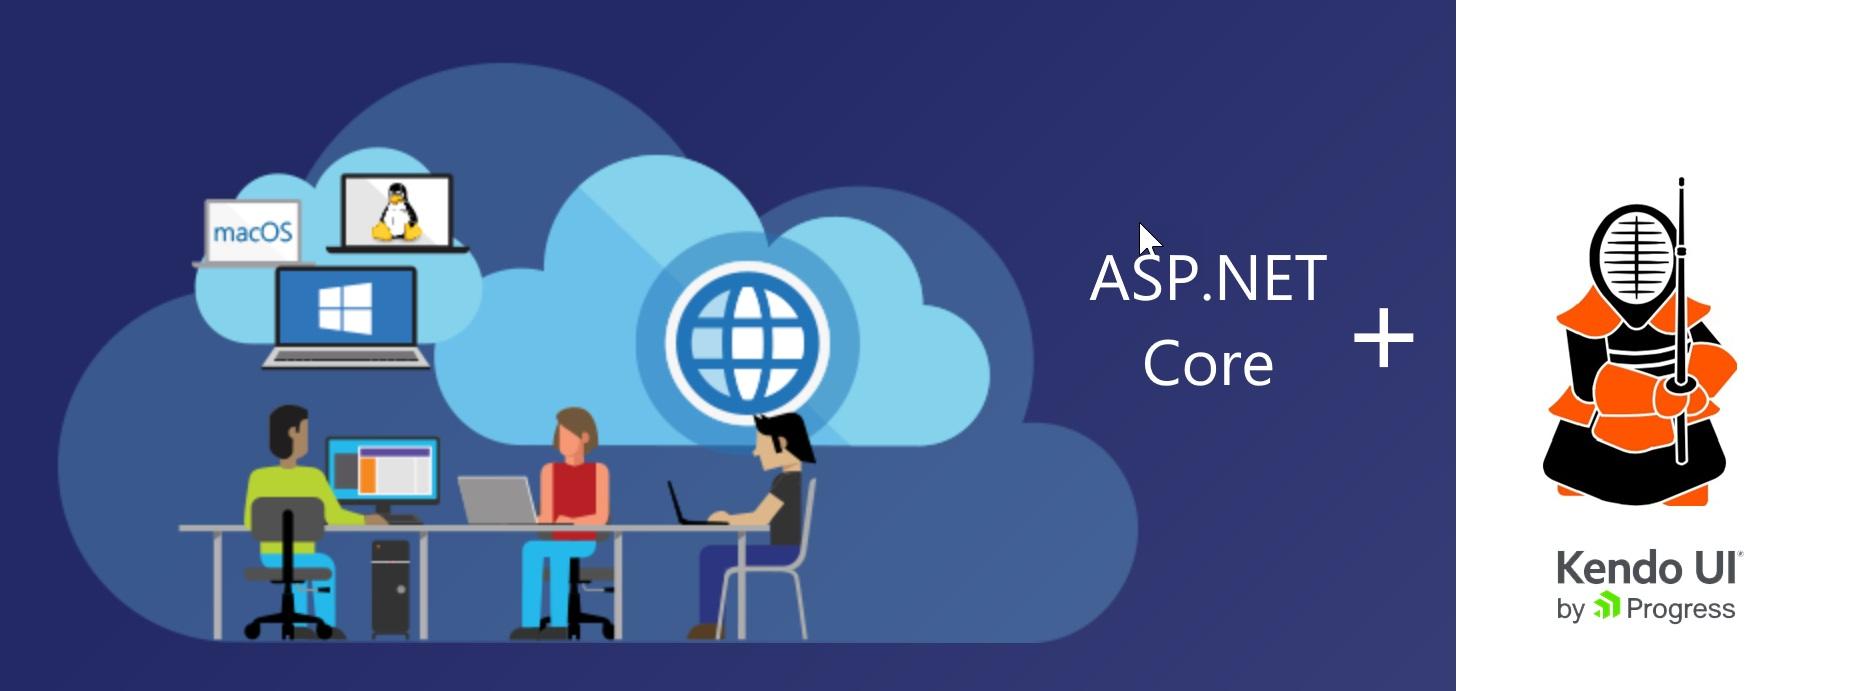 How To: Use Kendo UI Core in ASP NET MVC Core | Telerik Helper